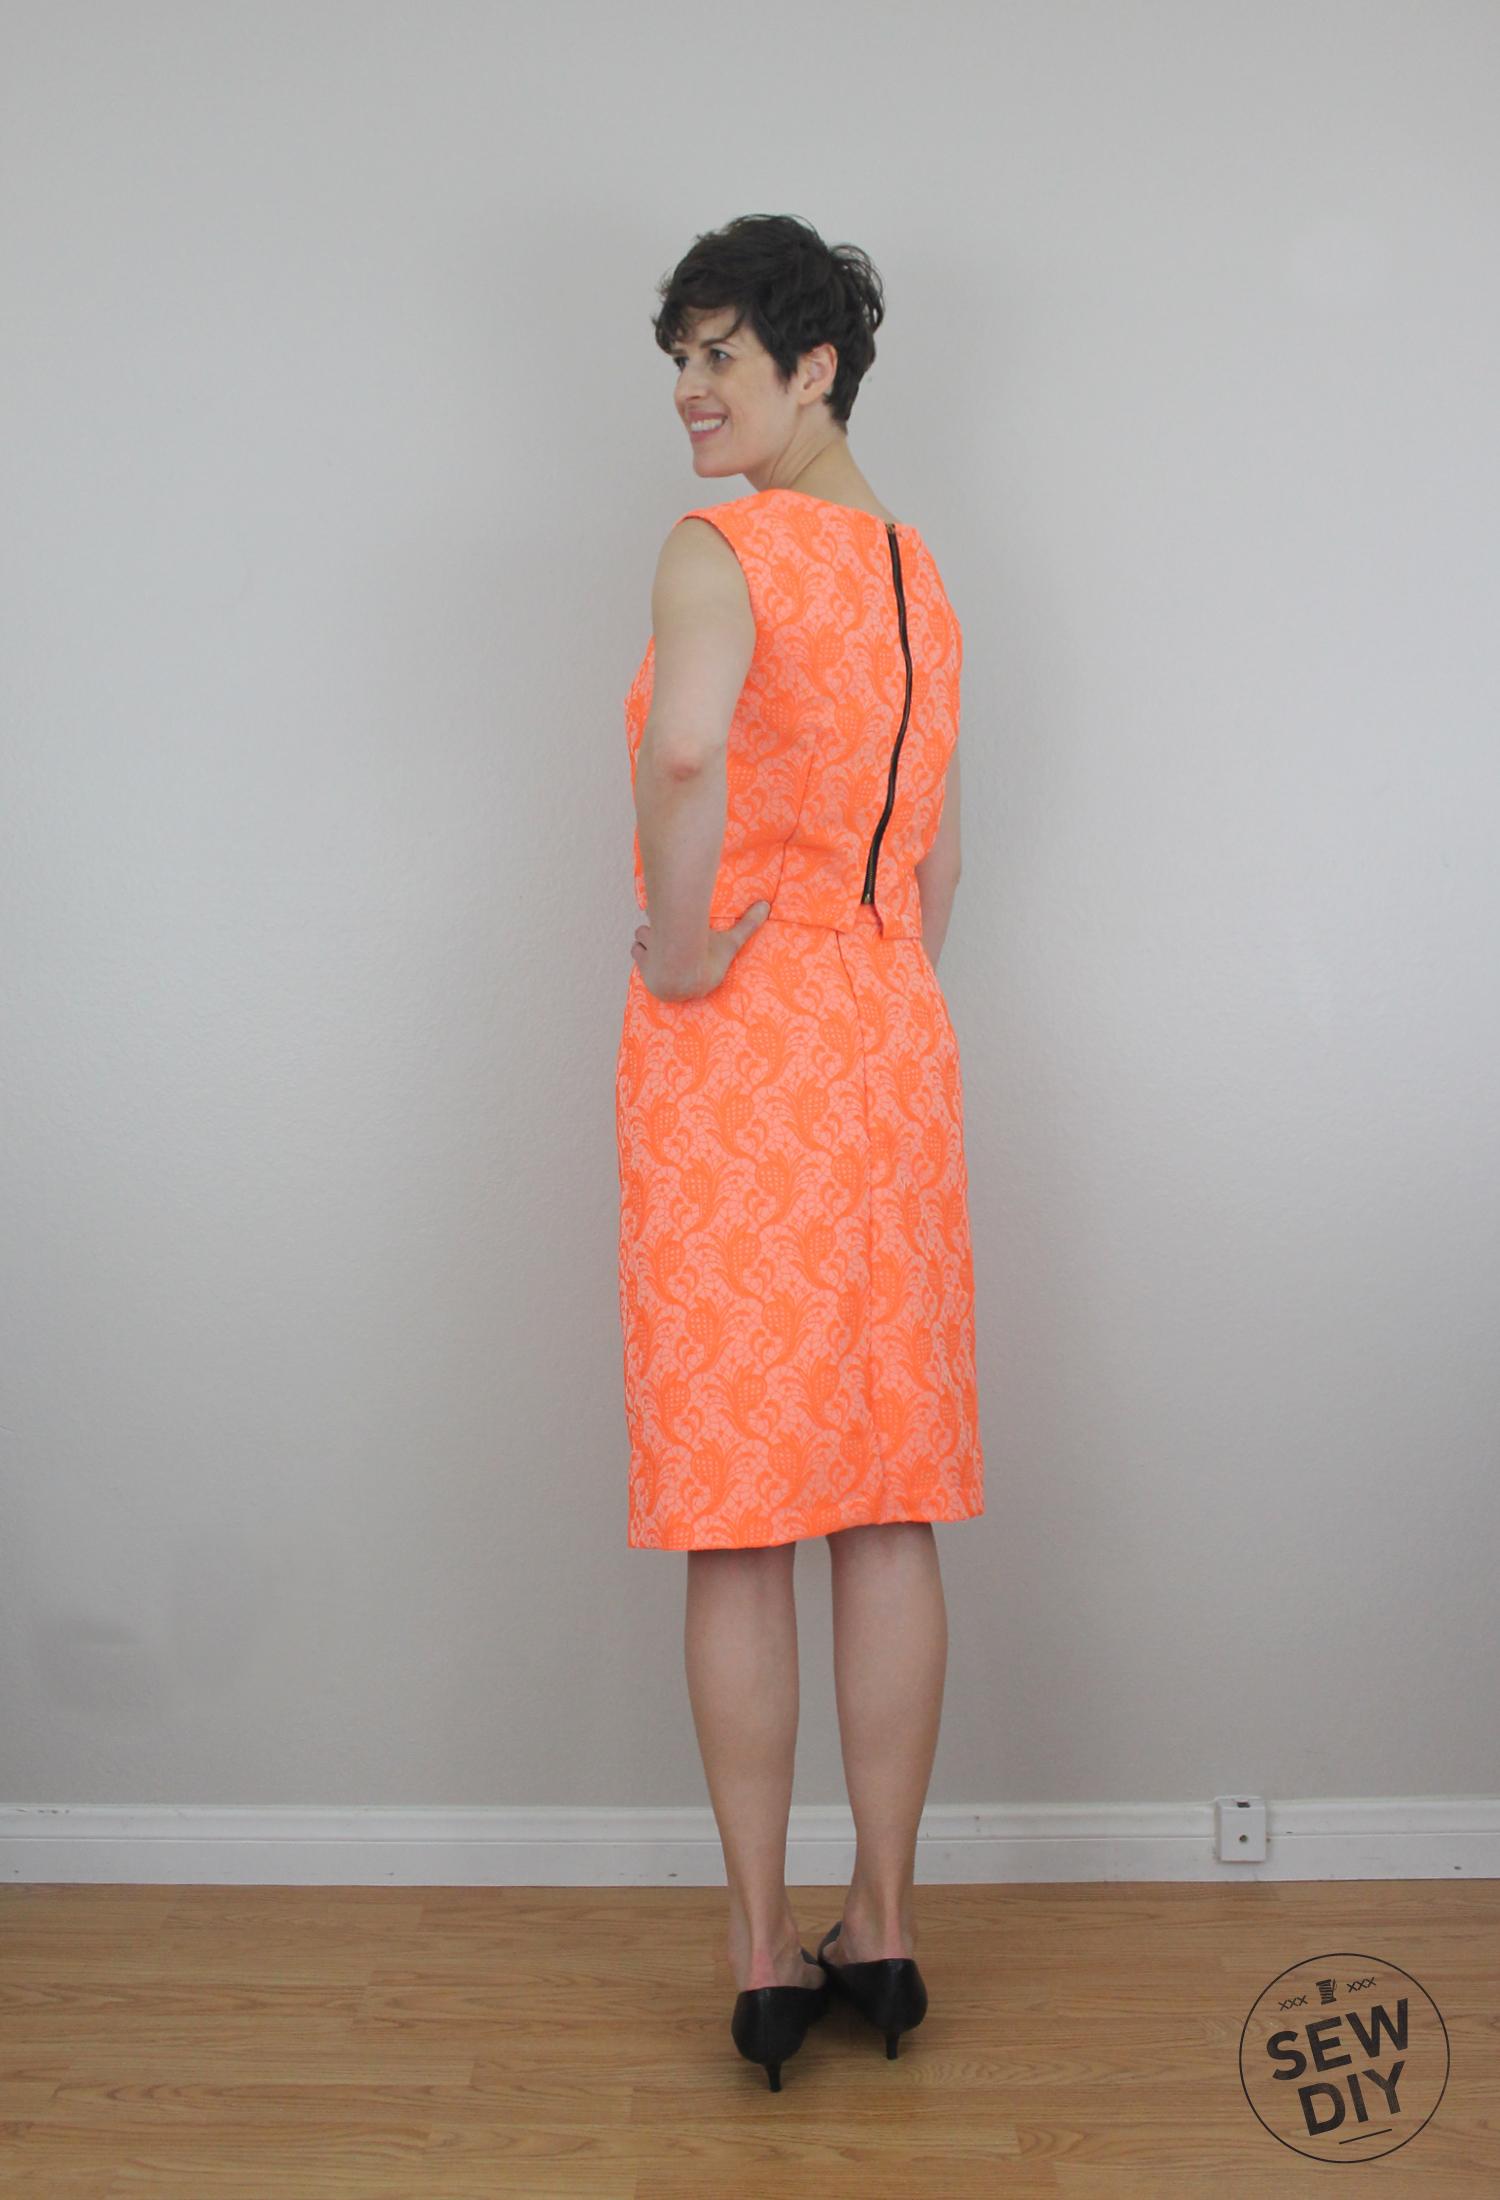 Sew DIY Neon Orange Brocade Pencil Skirt Back